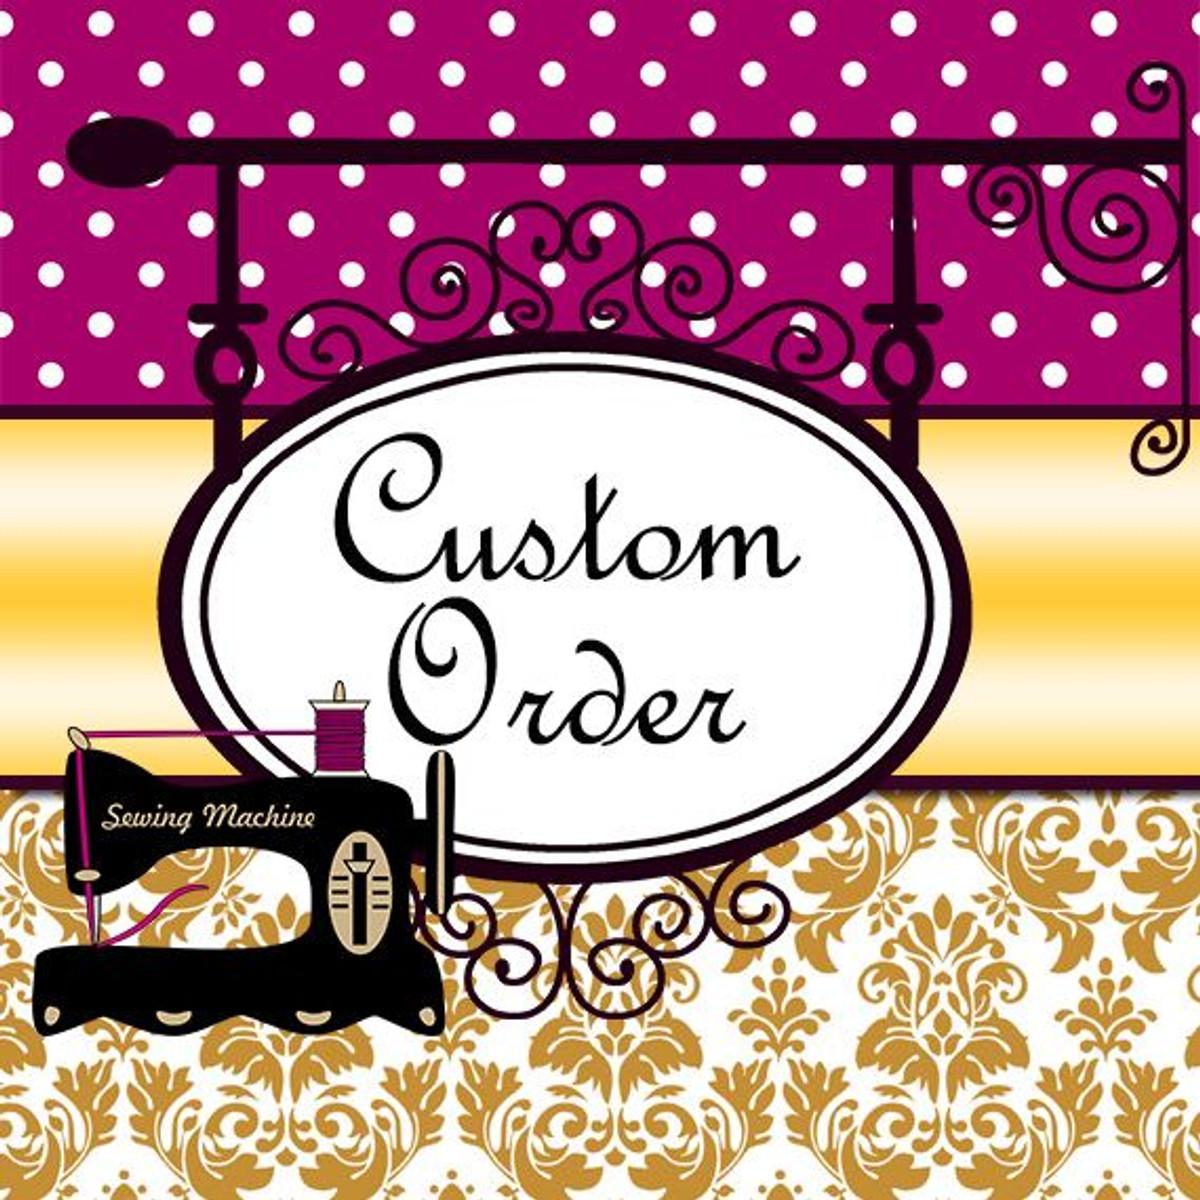 Custom Wedding Dress for KaylaK